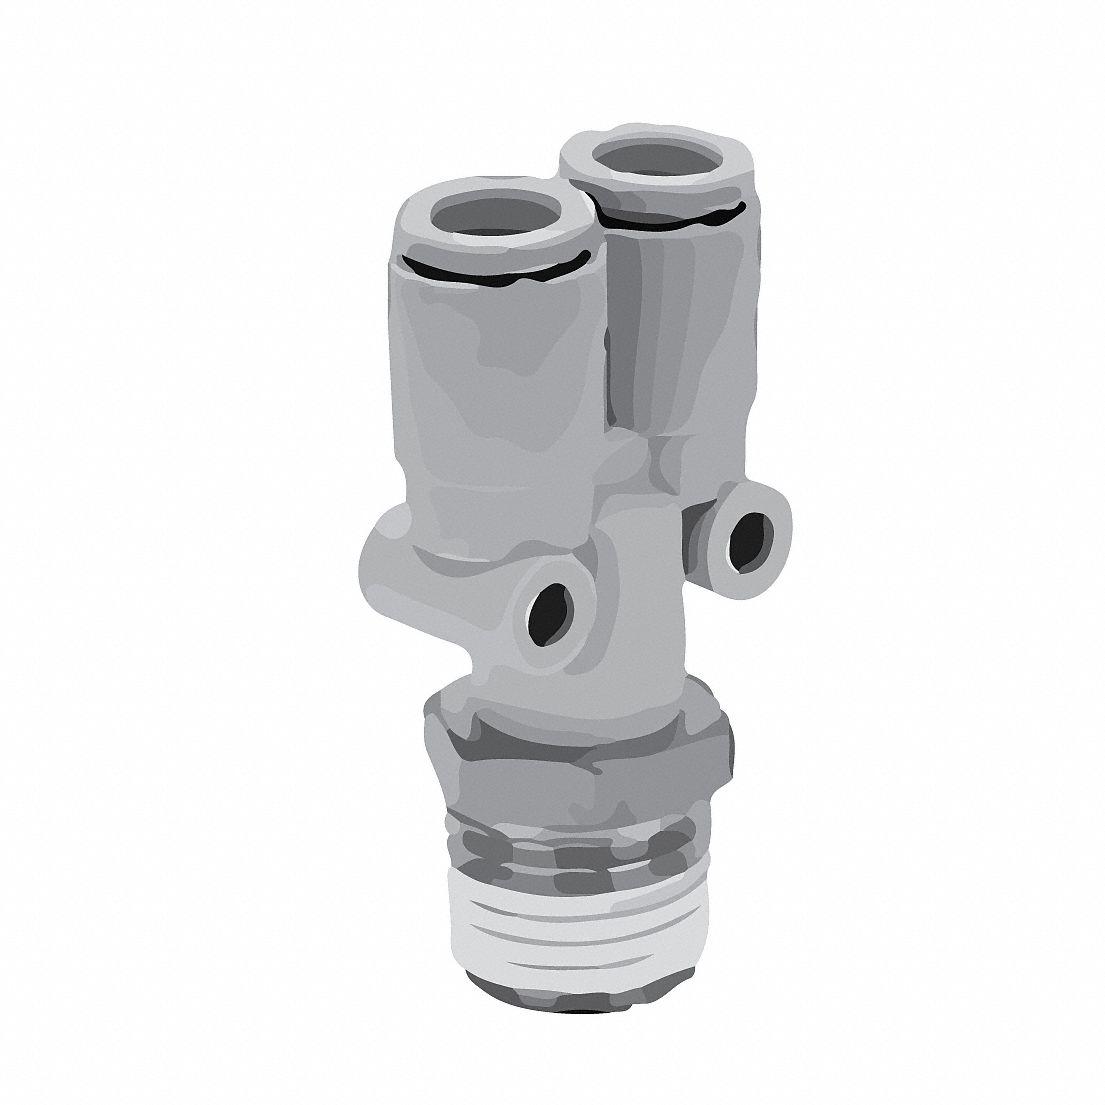 Aignep USA Plug-In Y Conn 8mm Stud x 6mm Tube Pkg Qty 5